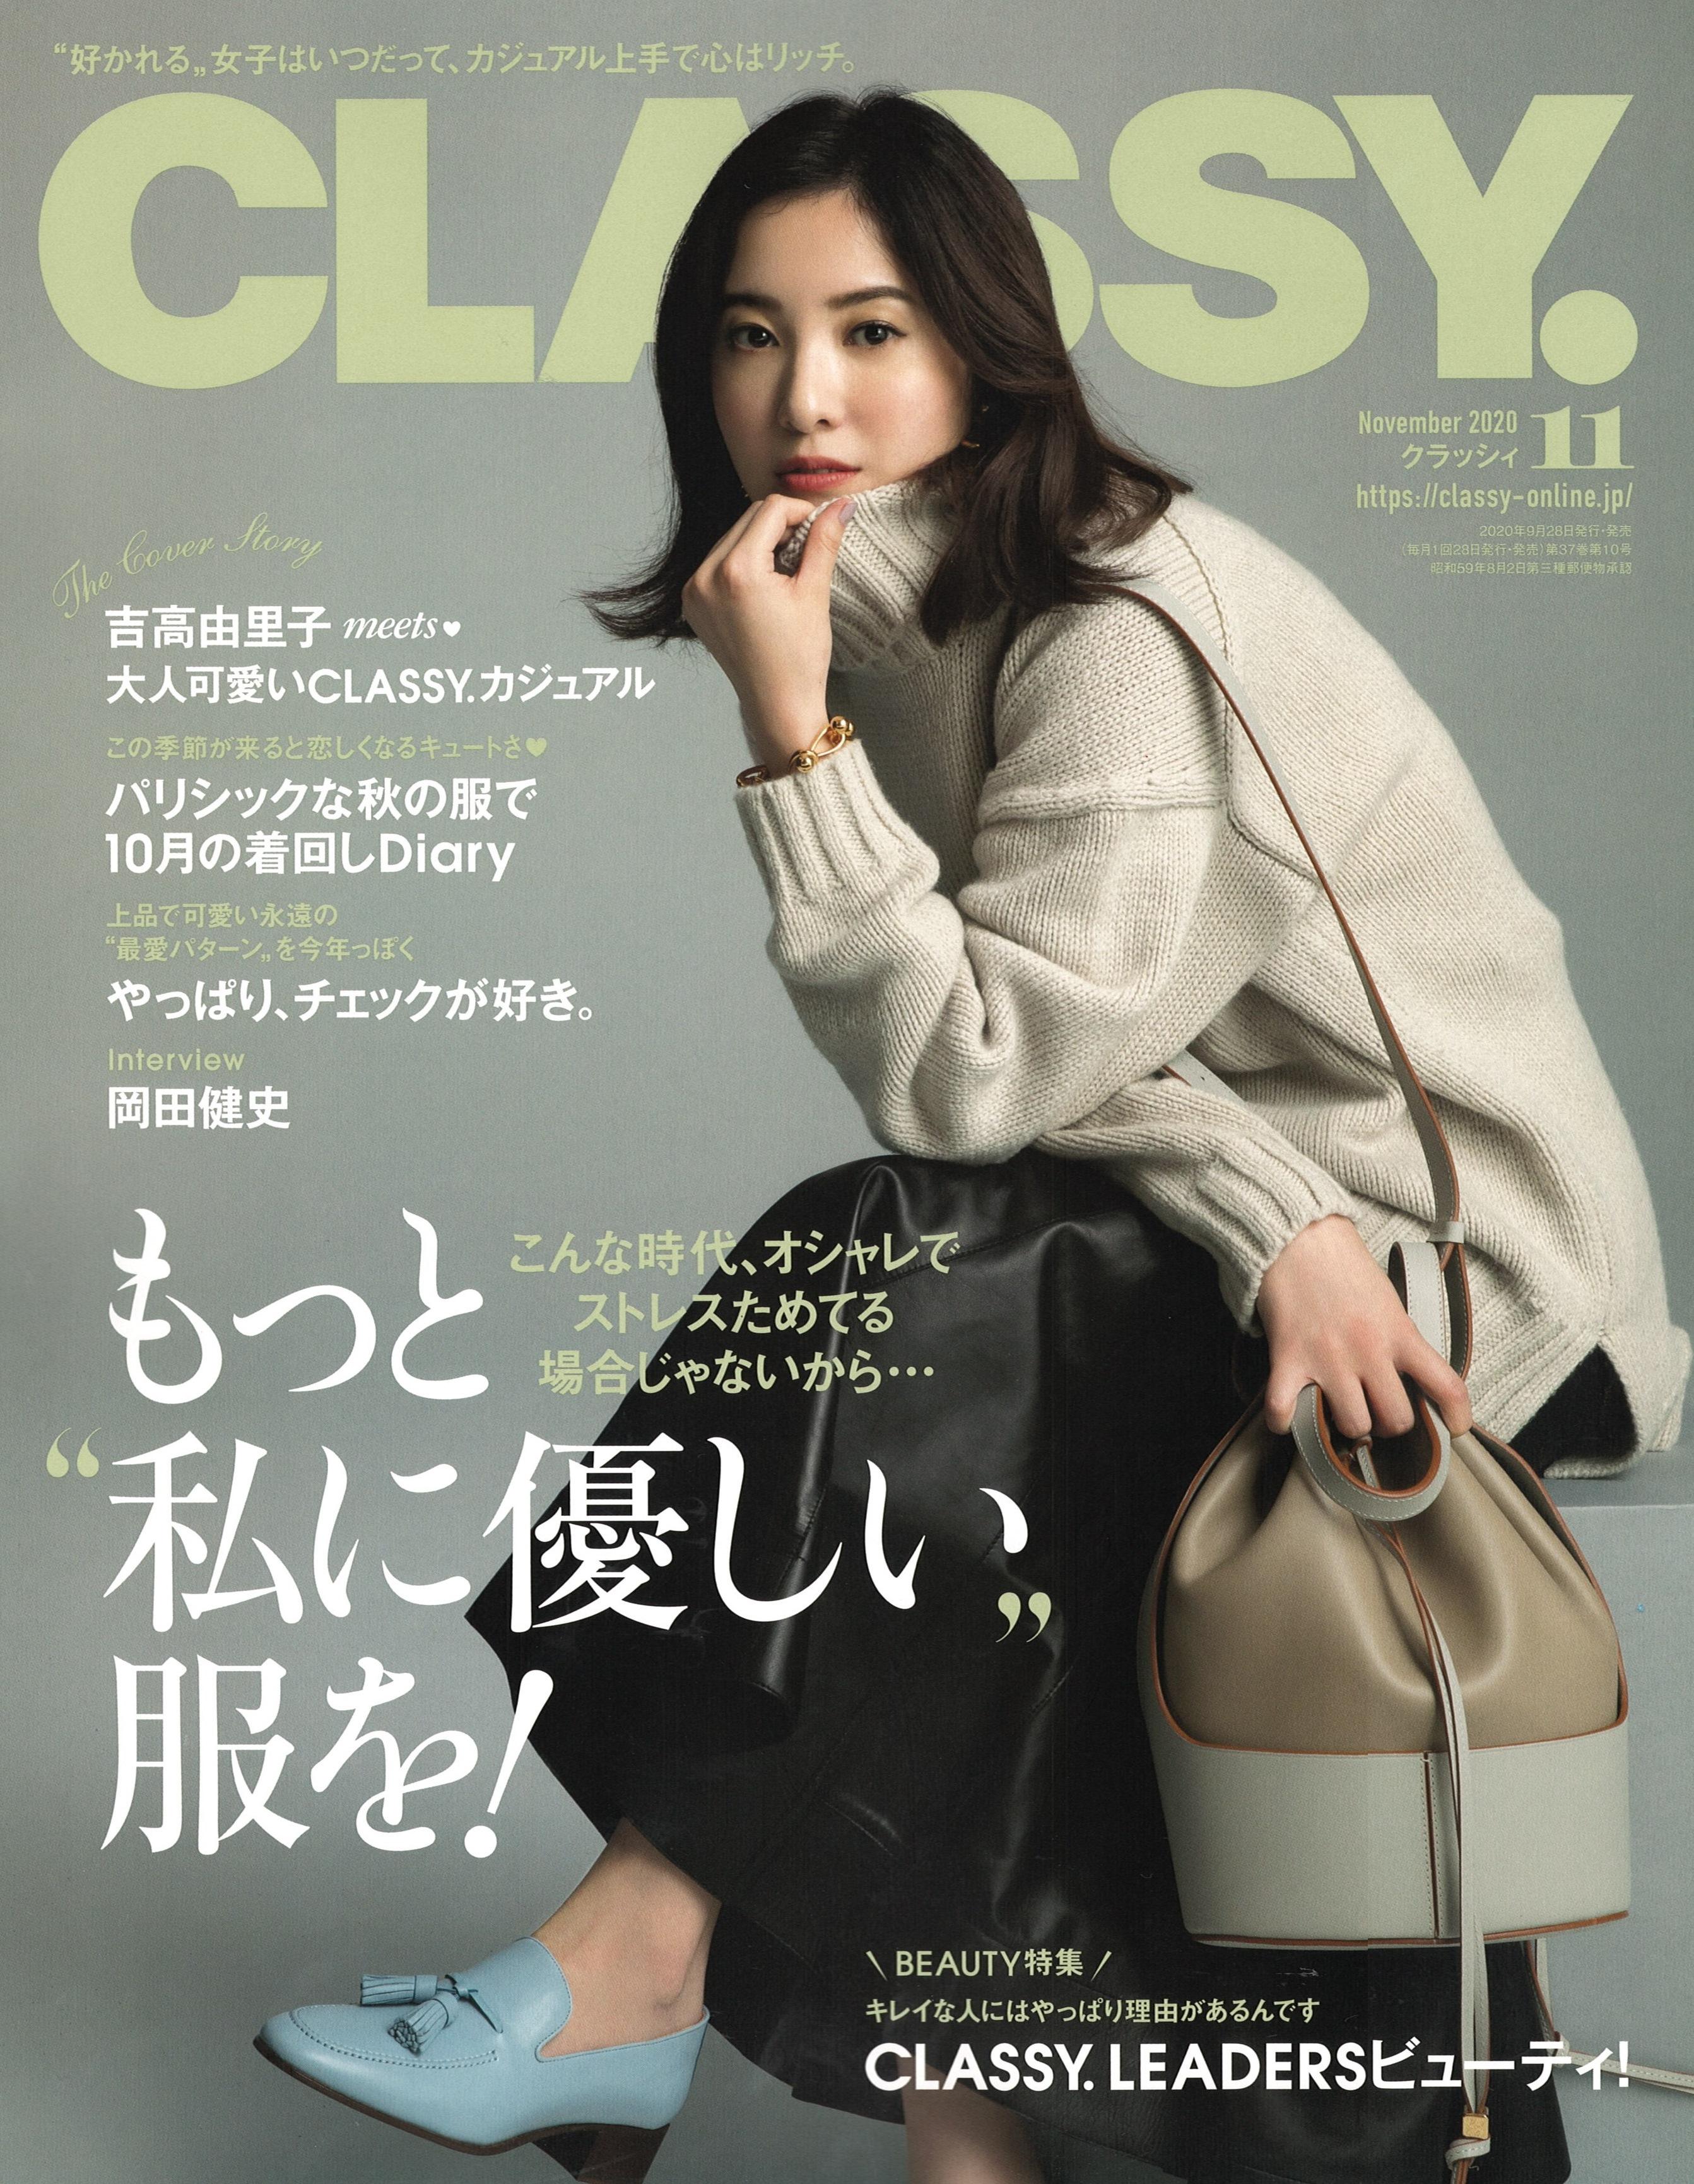 classy.2020.9.28cover.JPG